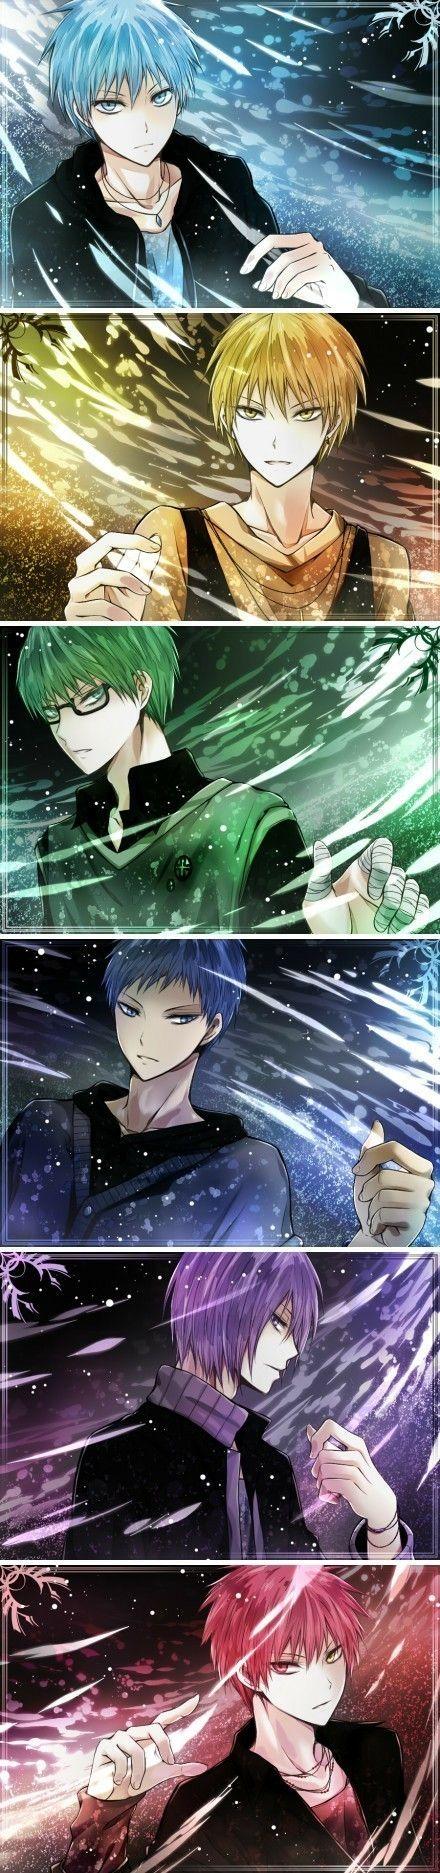 Ooohhhh very pretty art of all the boys, me likes very much | Kuroko, Kise, Midorima, Aomine, Akashi | KnS | KnB